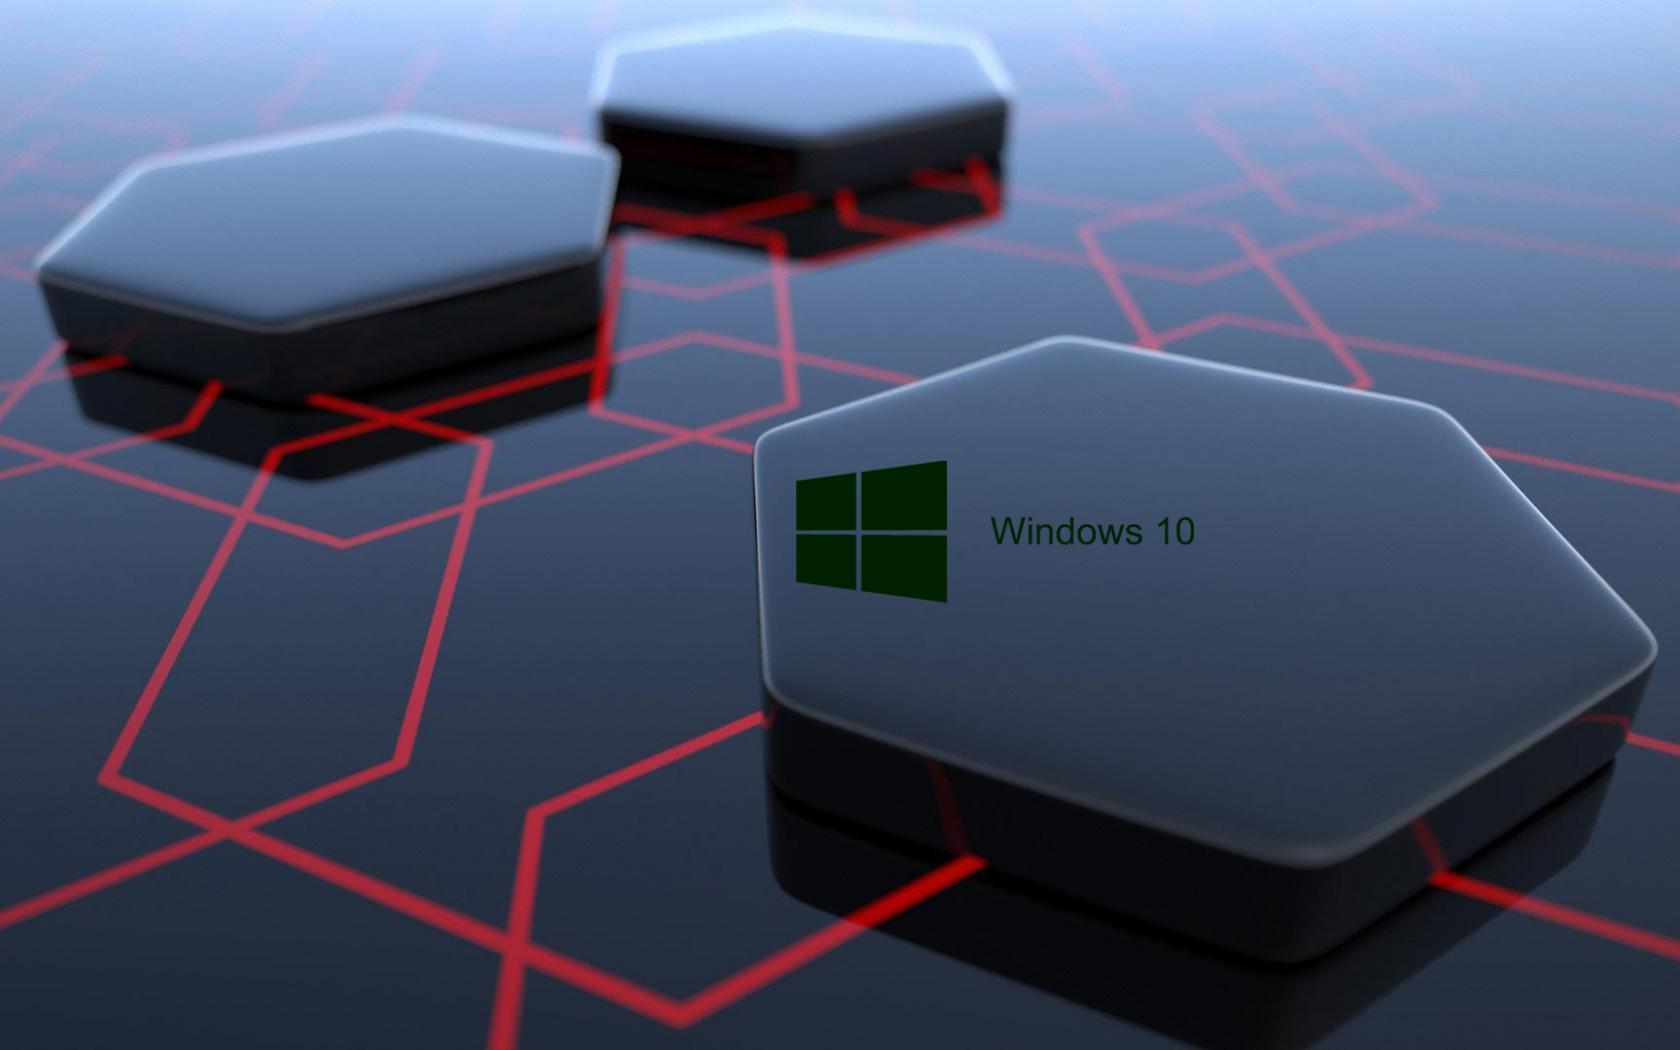 Windows 10 Desktop Image with 3d Art Black Hexagonal Wallpapers   HD ...